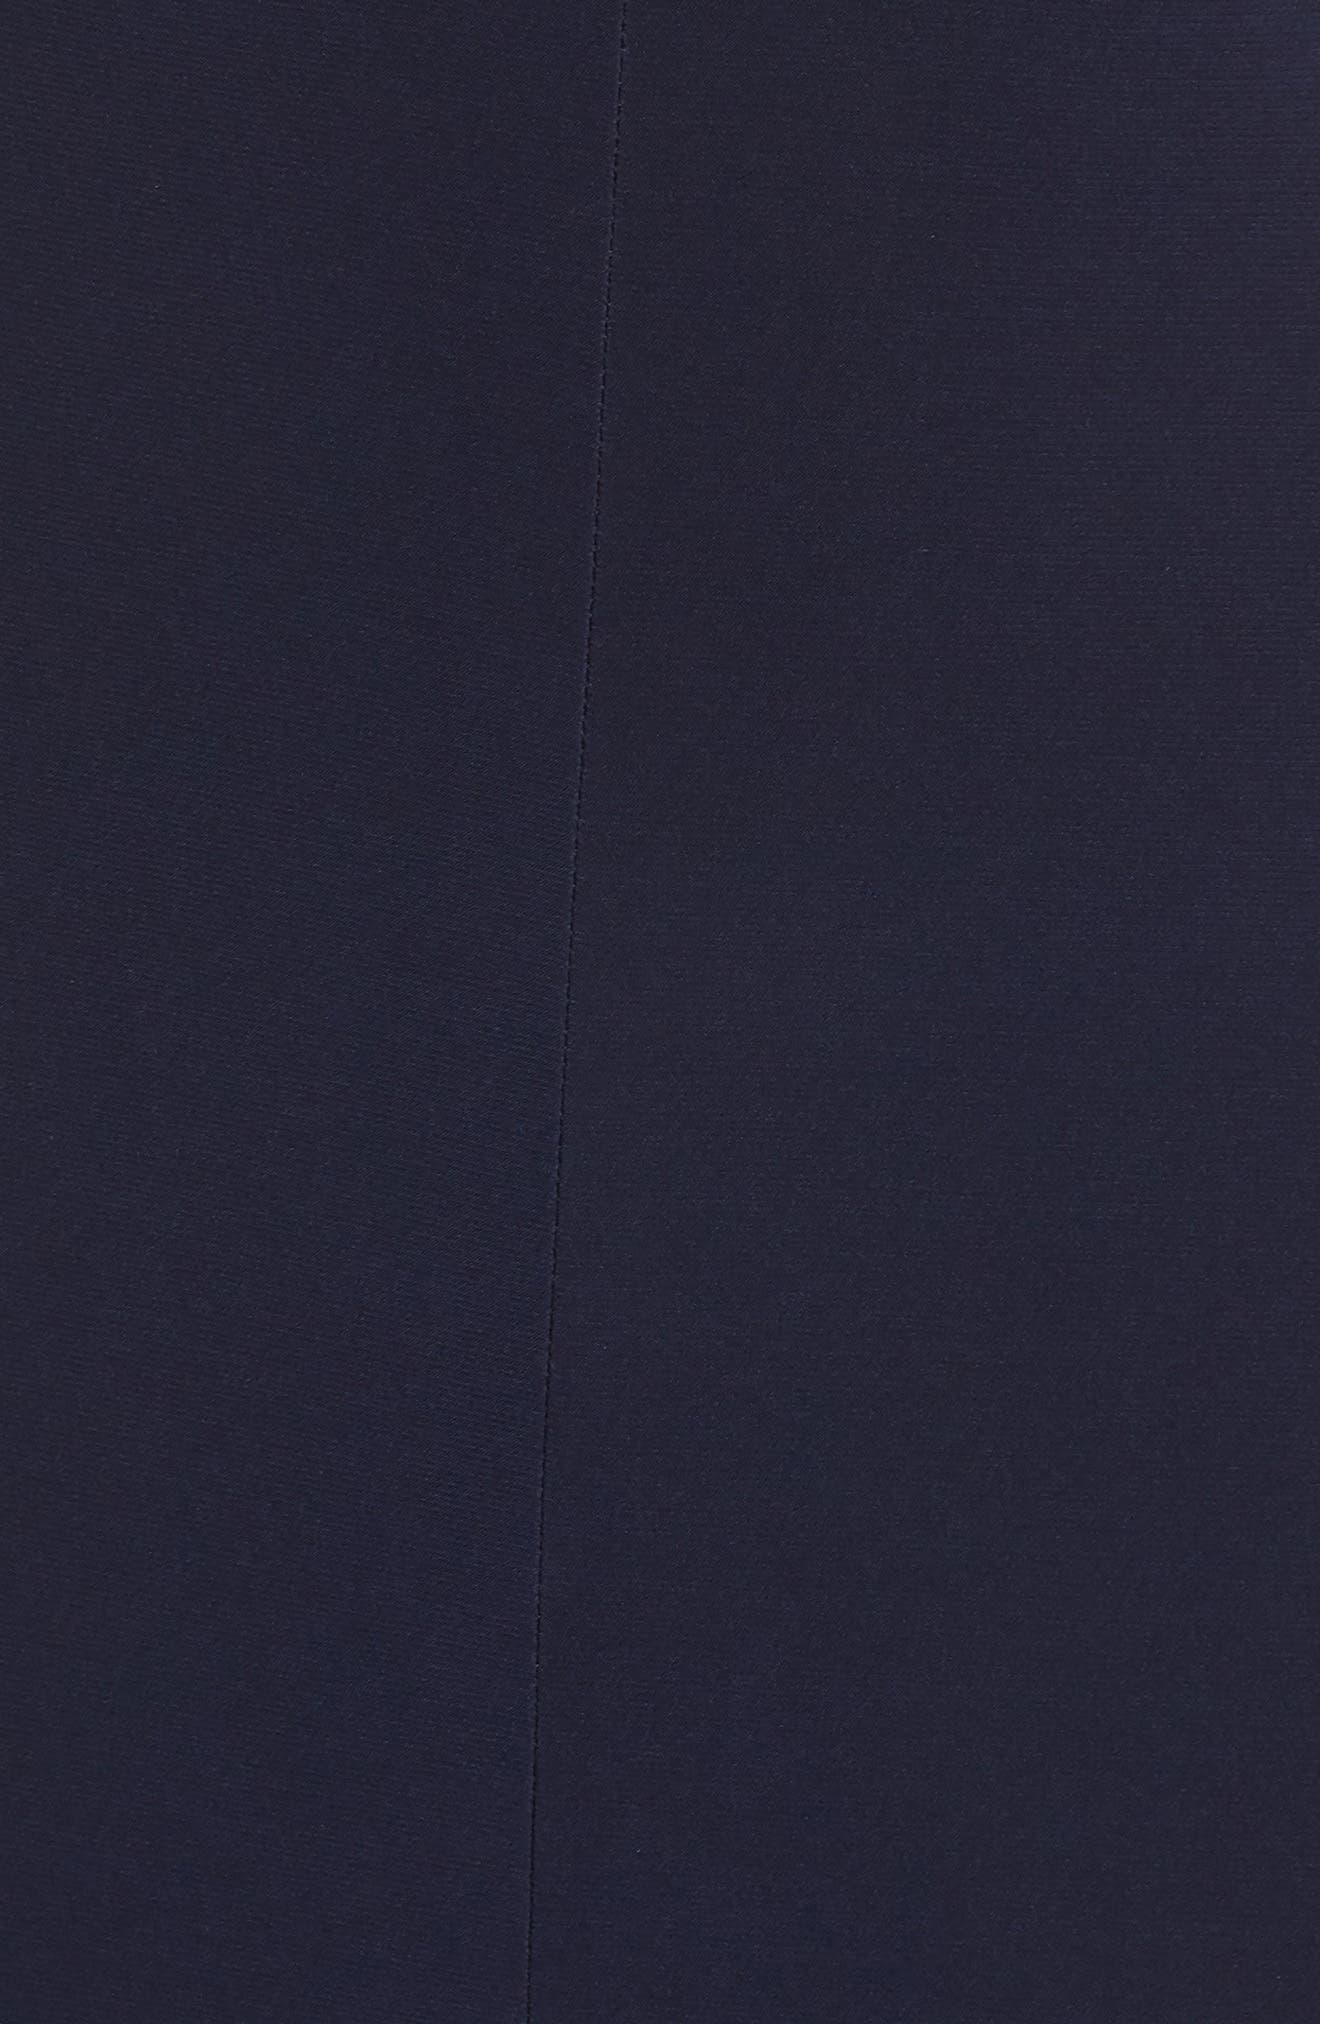 Cold Shoulder Gown,                             Alternate thumbnail 5, color,                             Navy